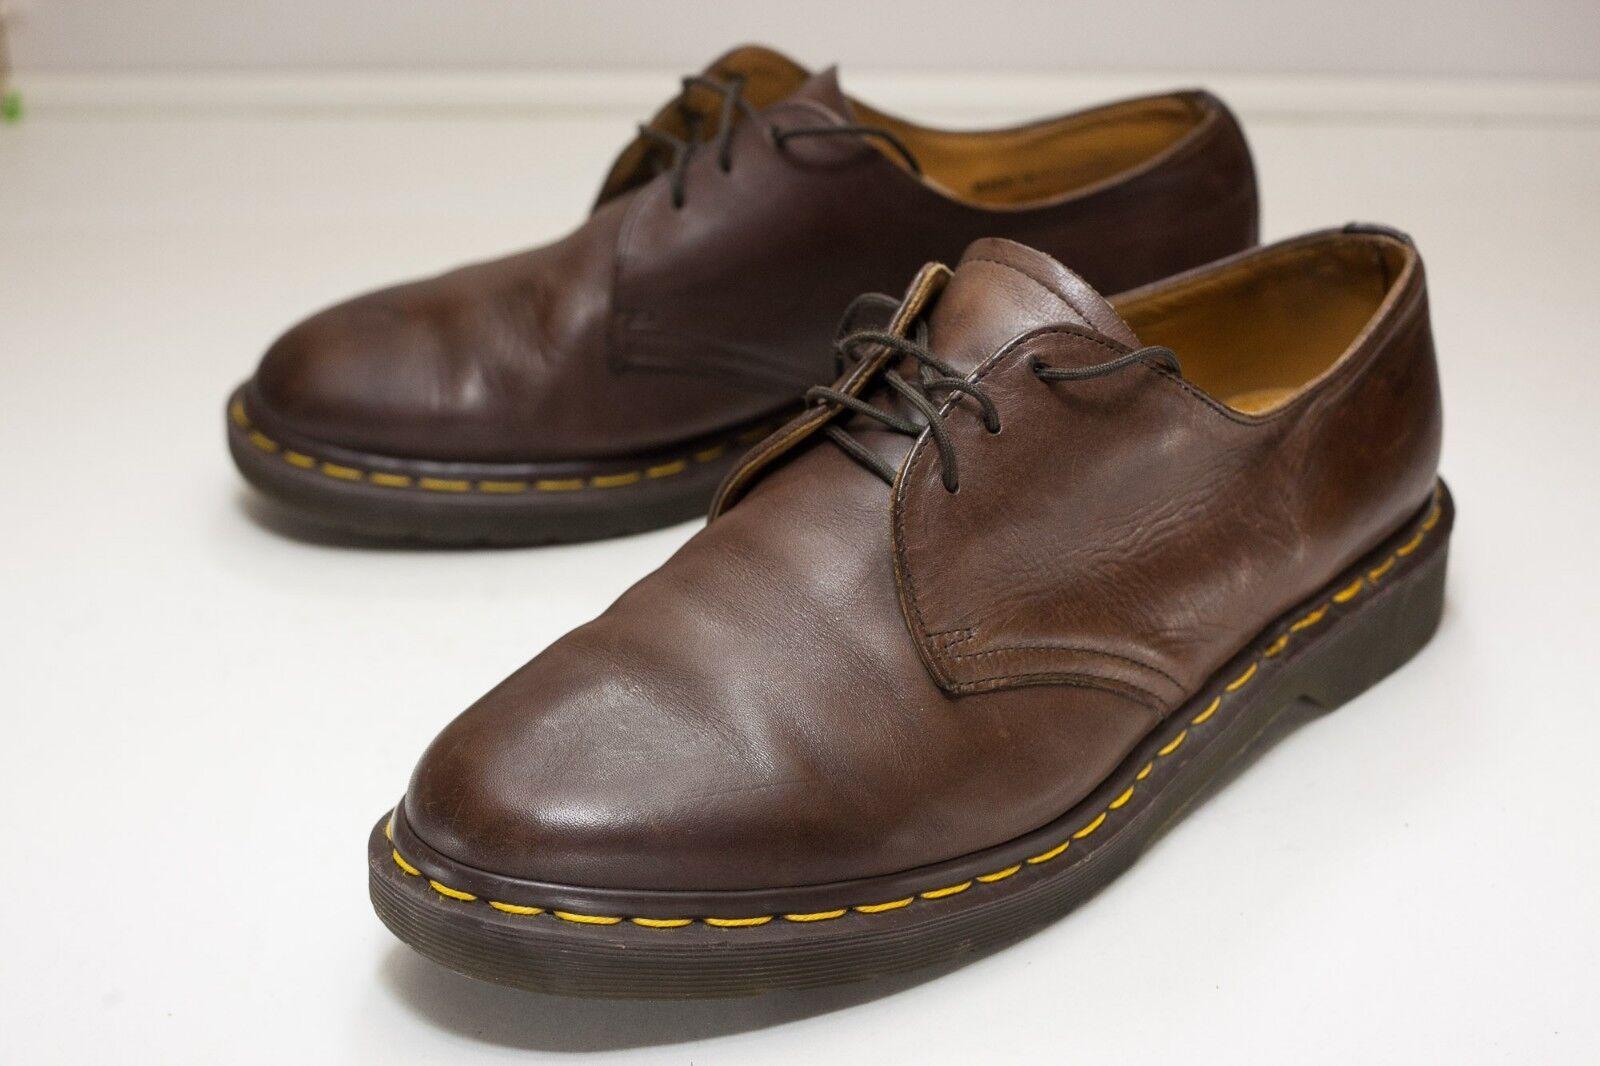 Dr. Martens Size 13 Brown Oxfords Men's - England